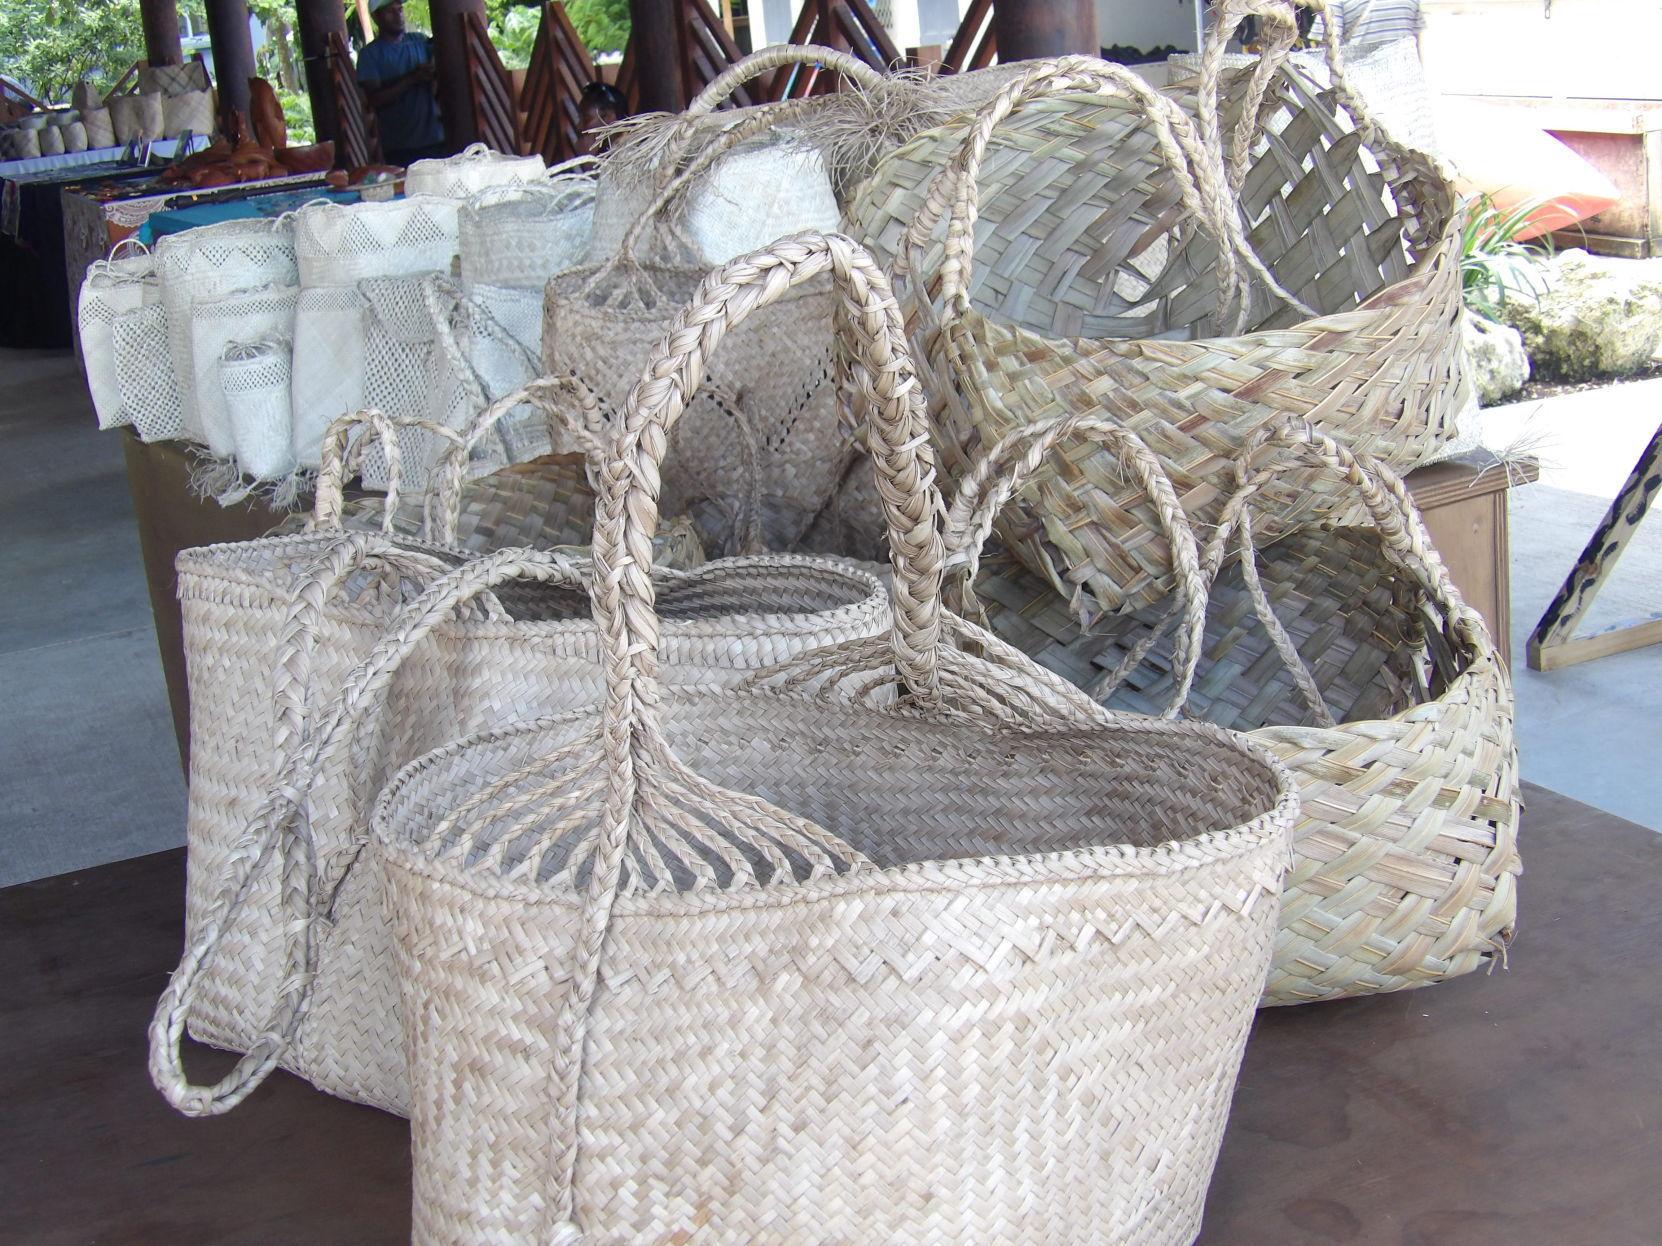 island-baskets-vanuatu